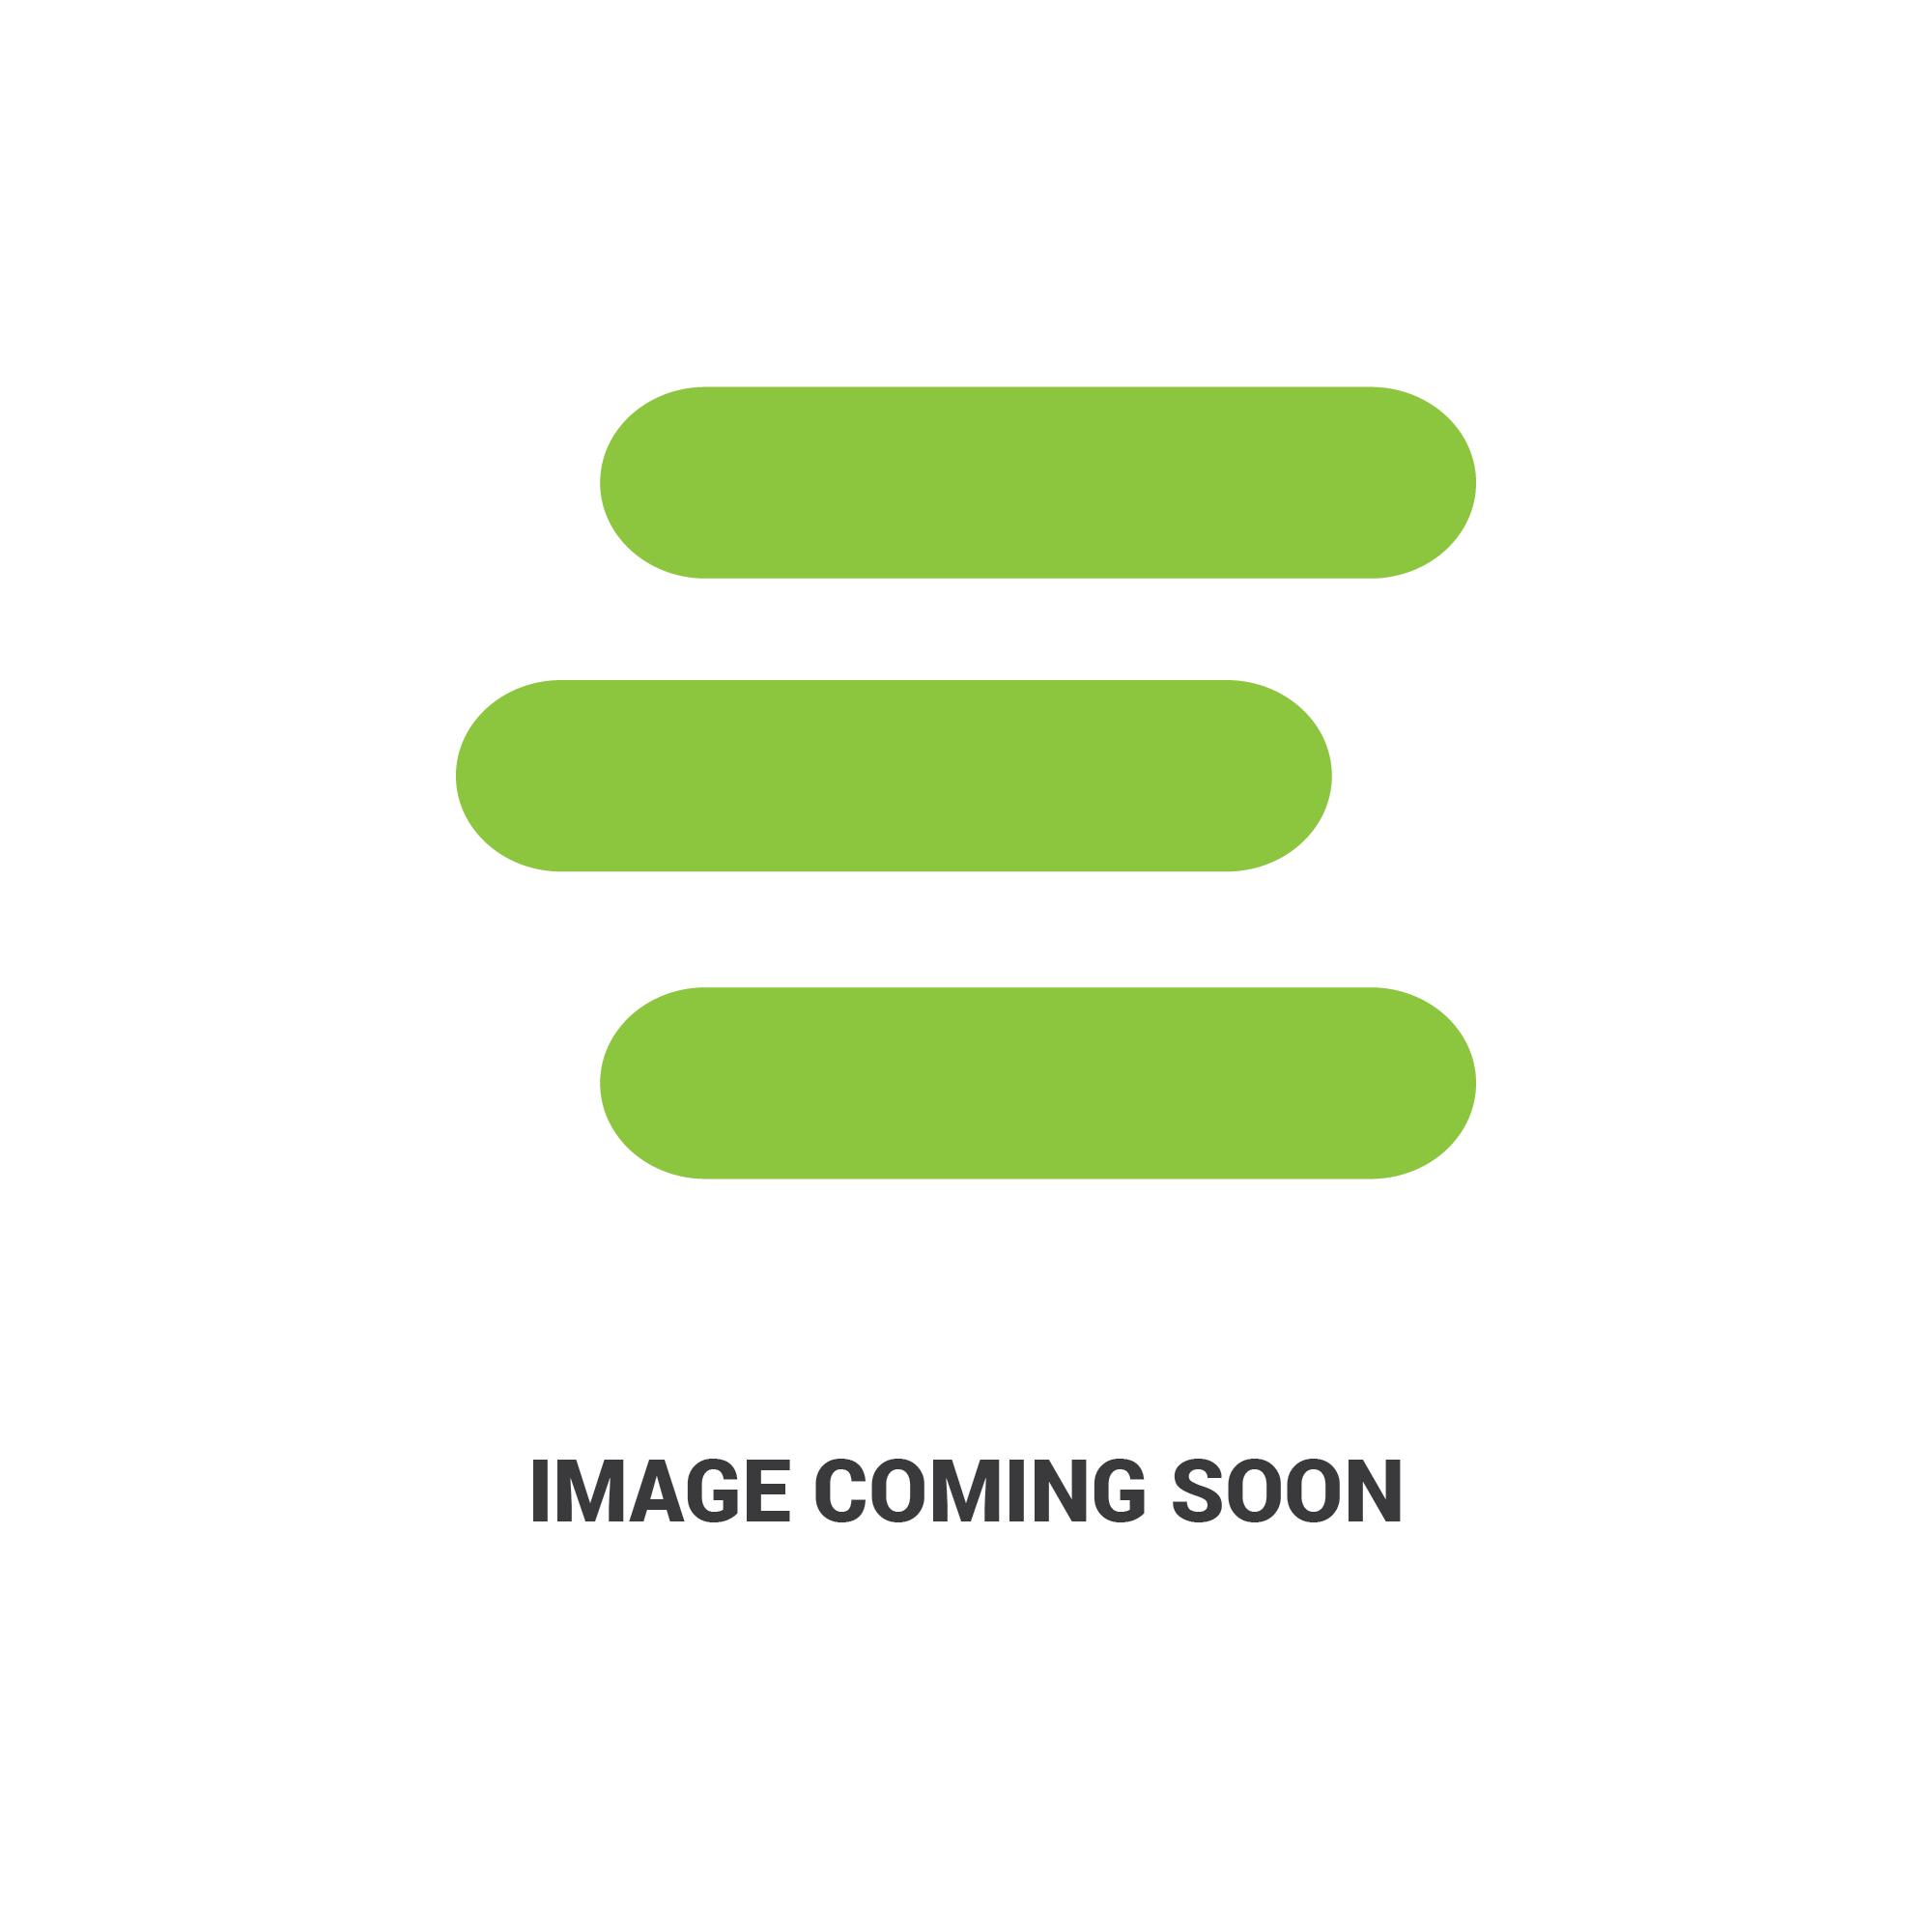 E-59700-26112edit 2.jpg